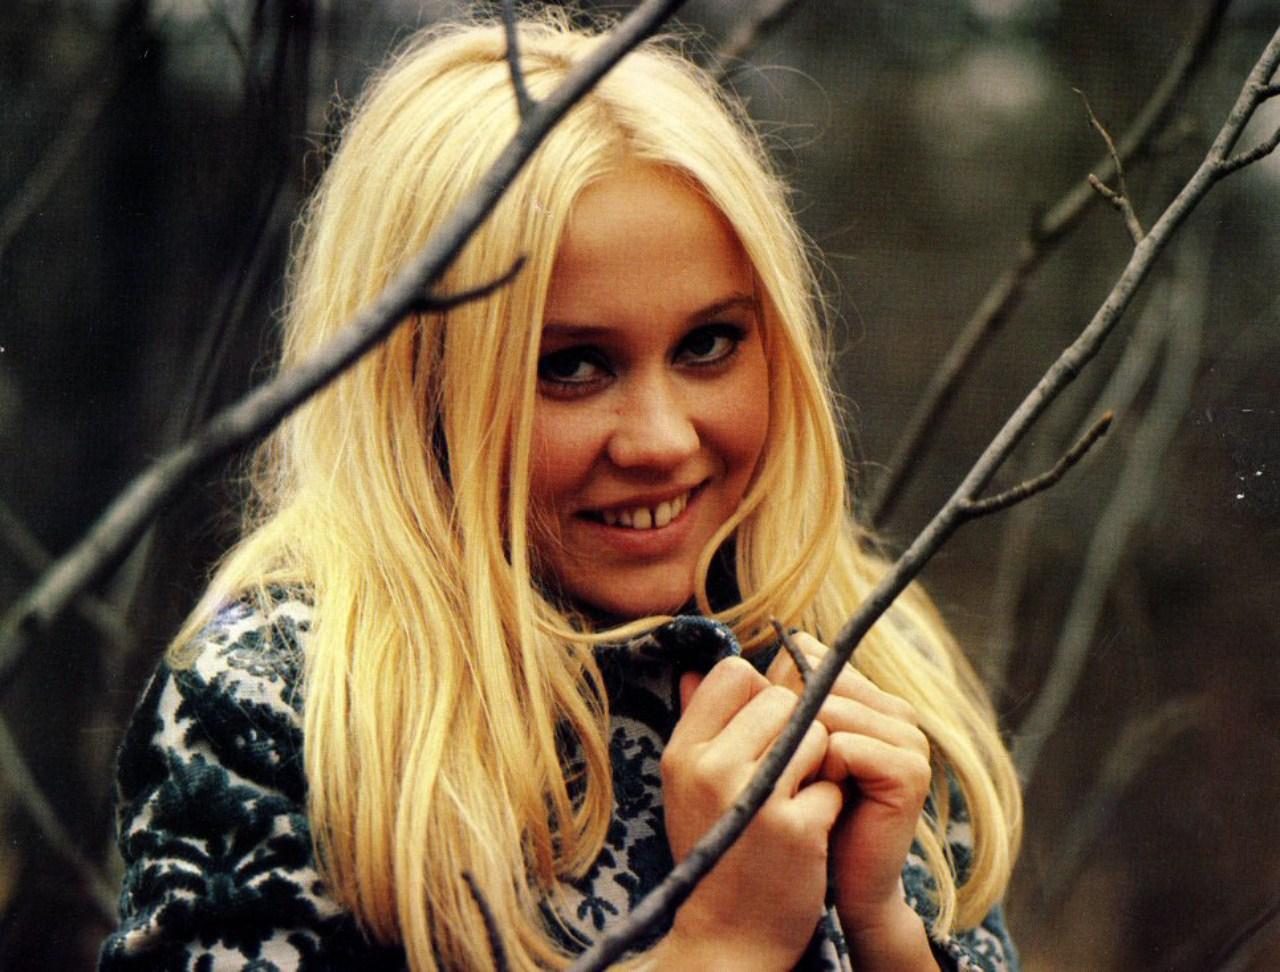 Agnetha som modeikon och en laptops död | Susanna's Crowbar